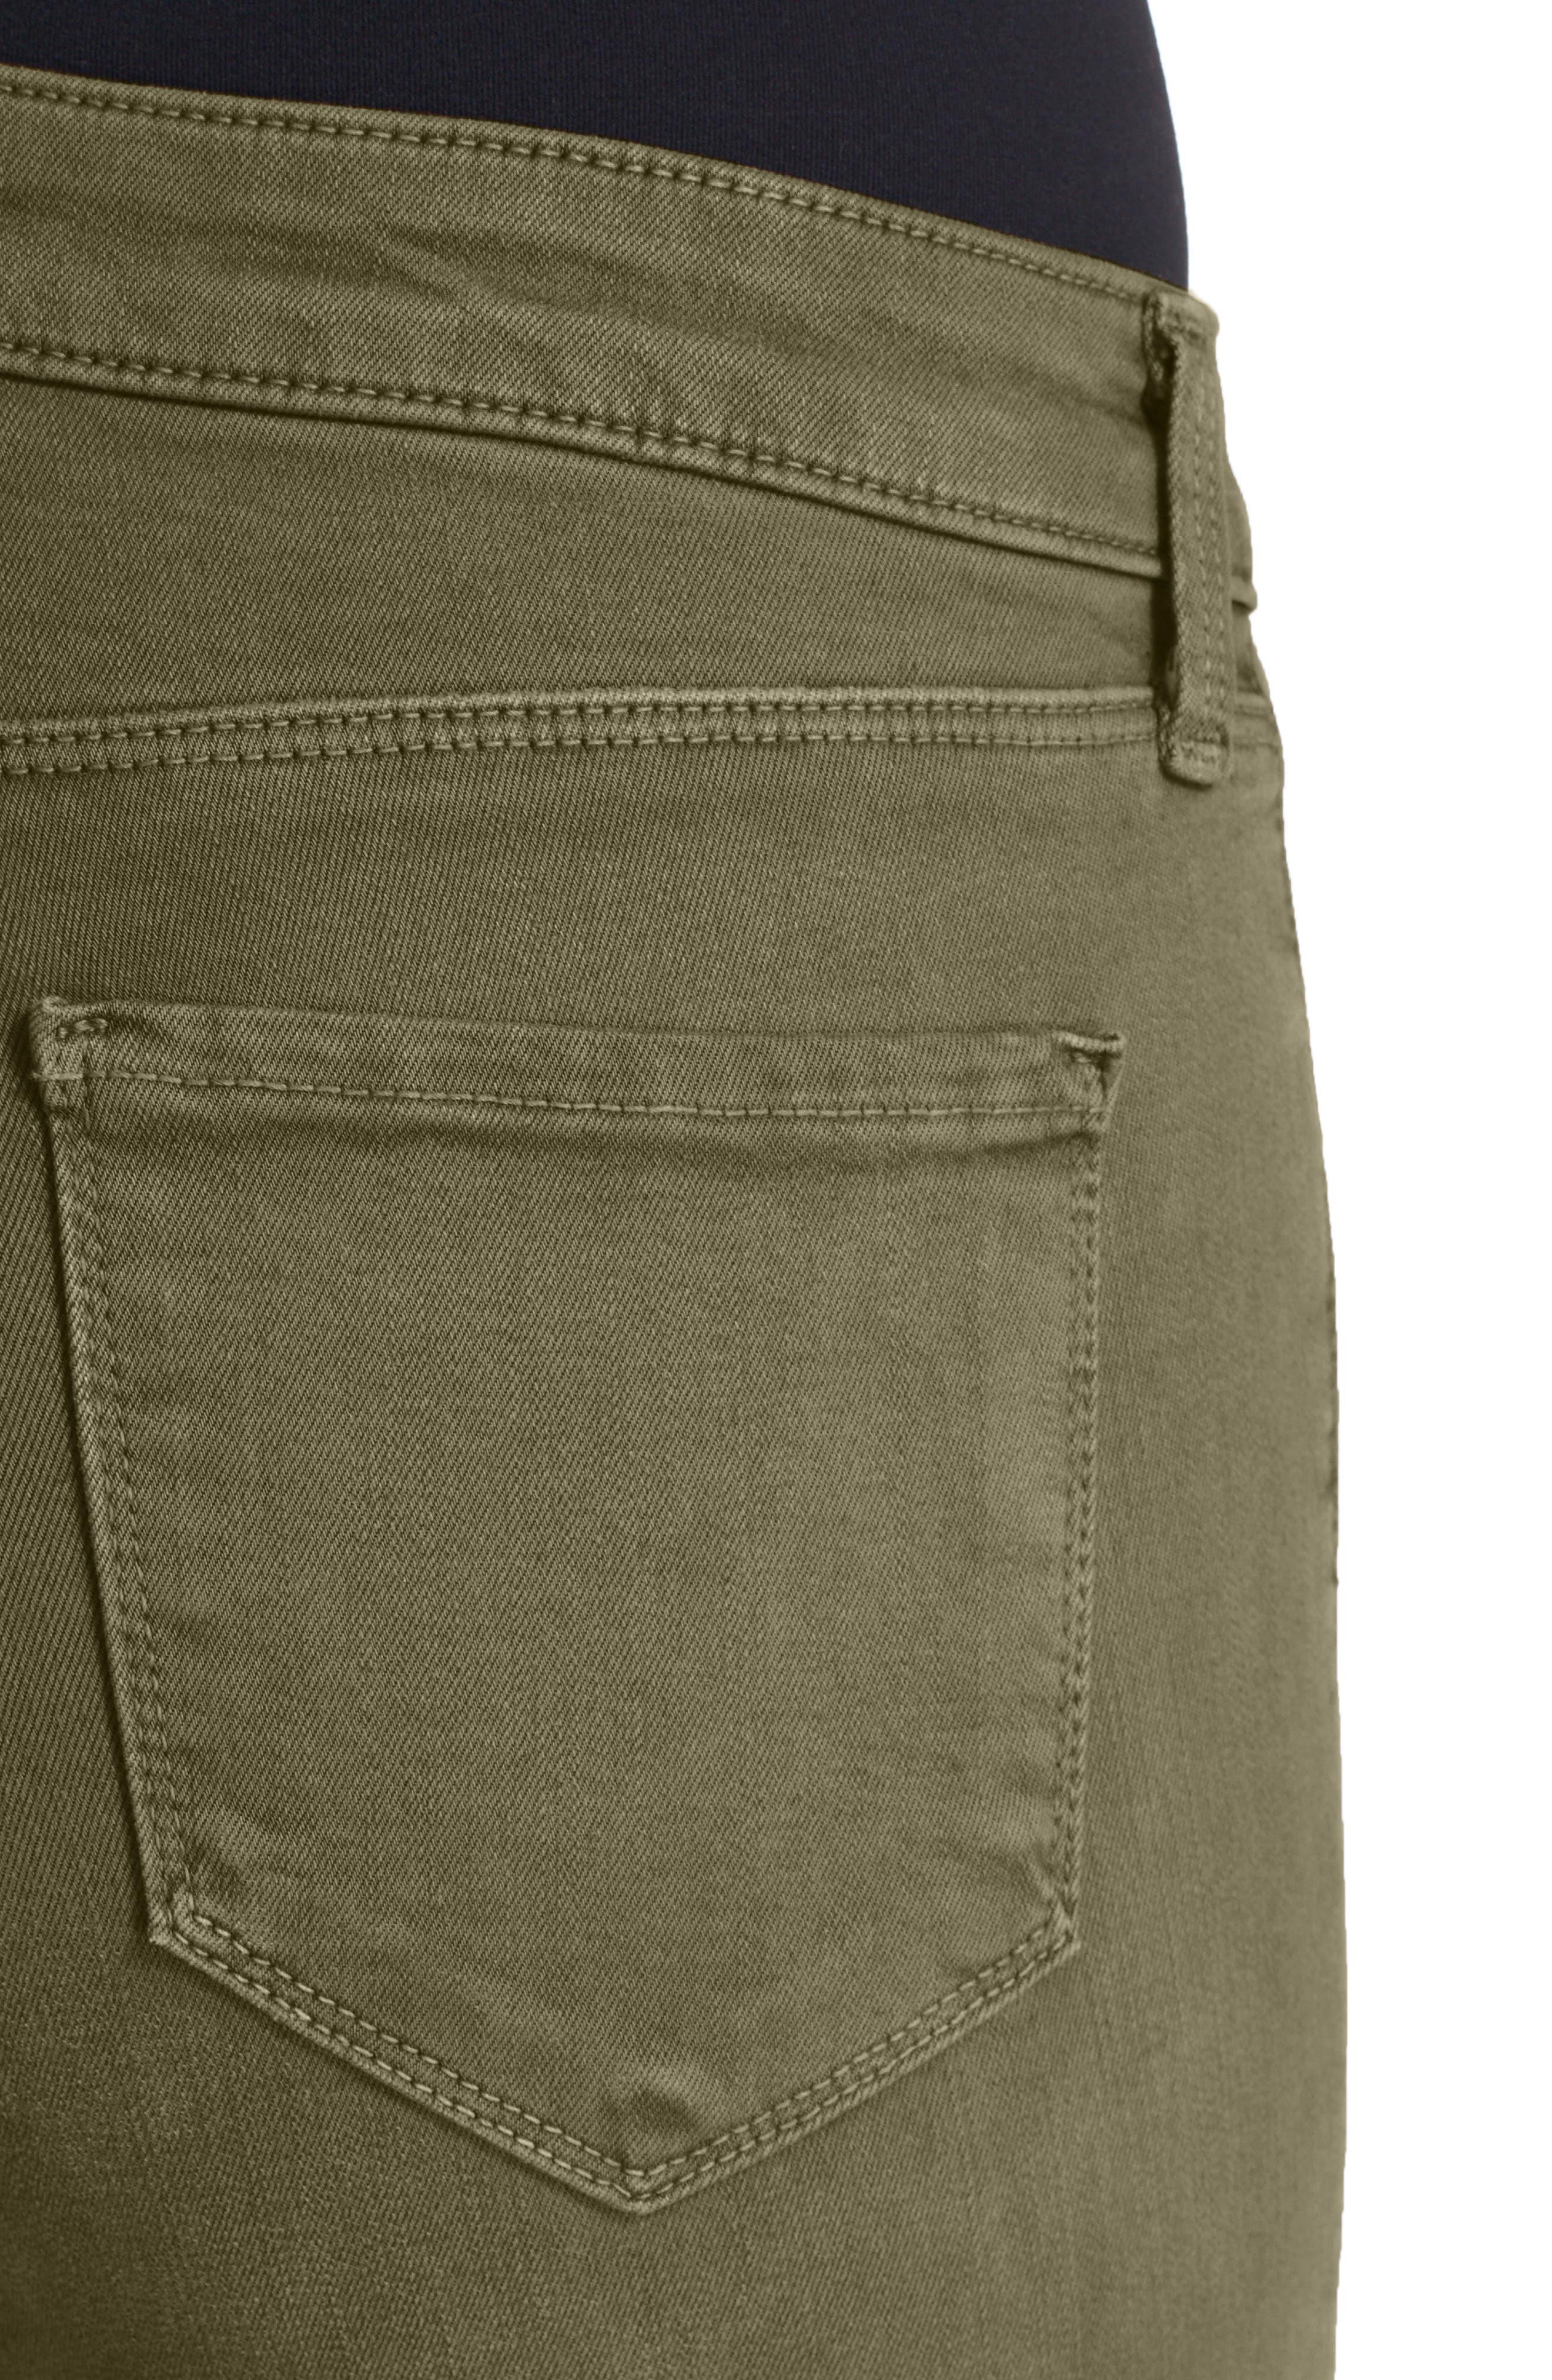 Alternate Image 4  - L'AGENCE High Waist Skinny Ankle Jeans